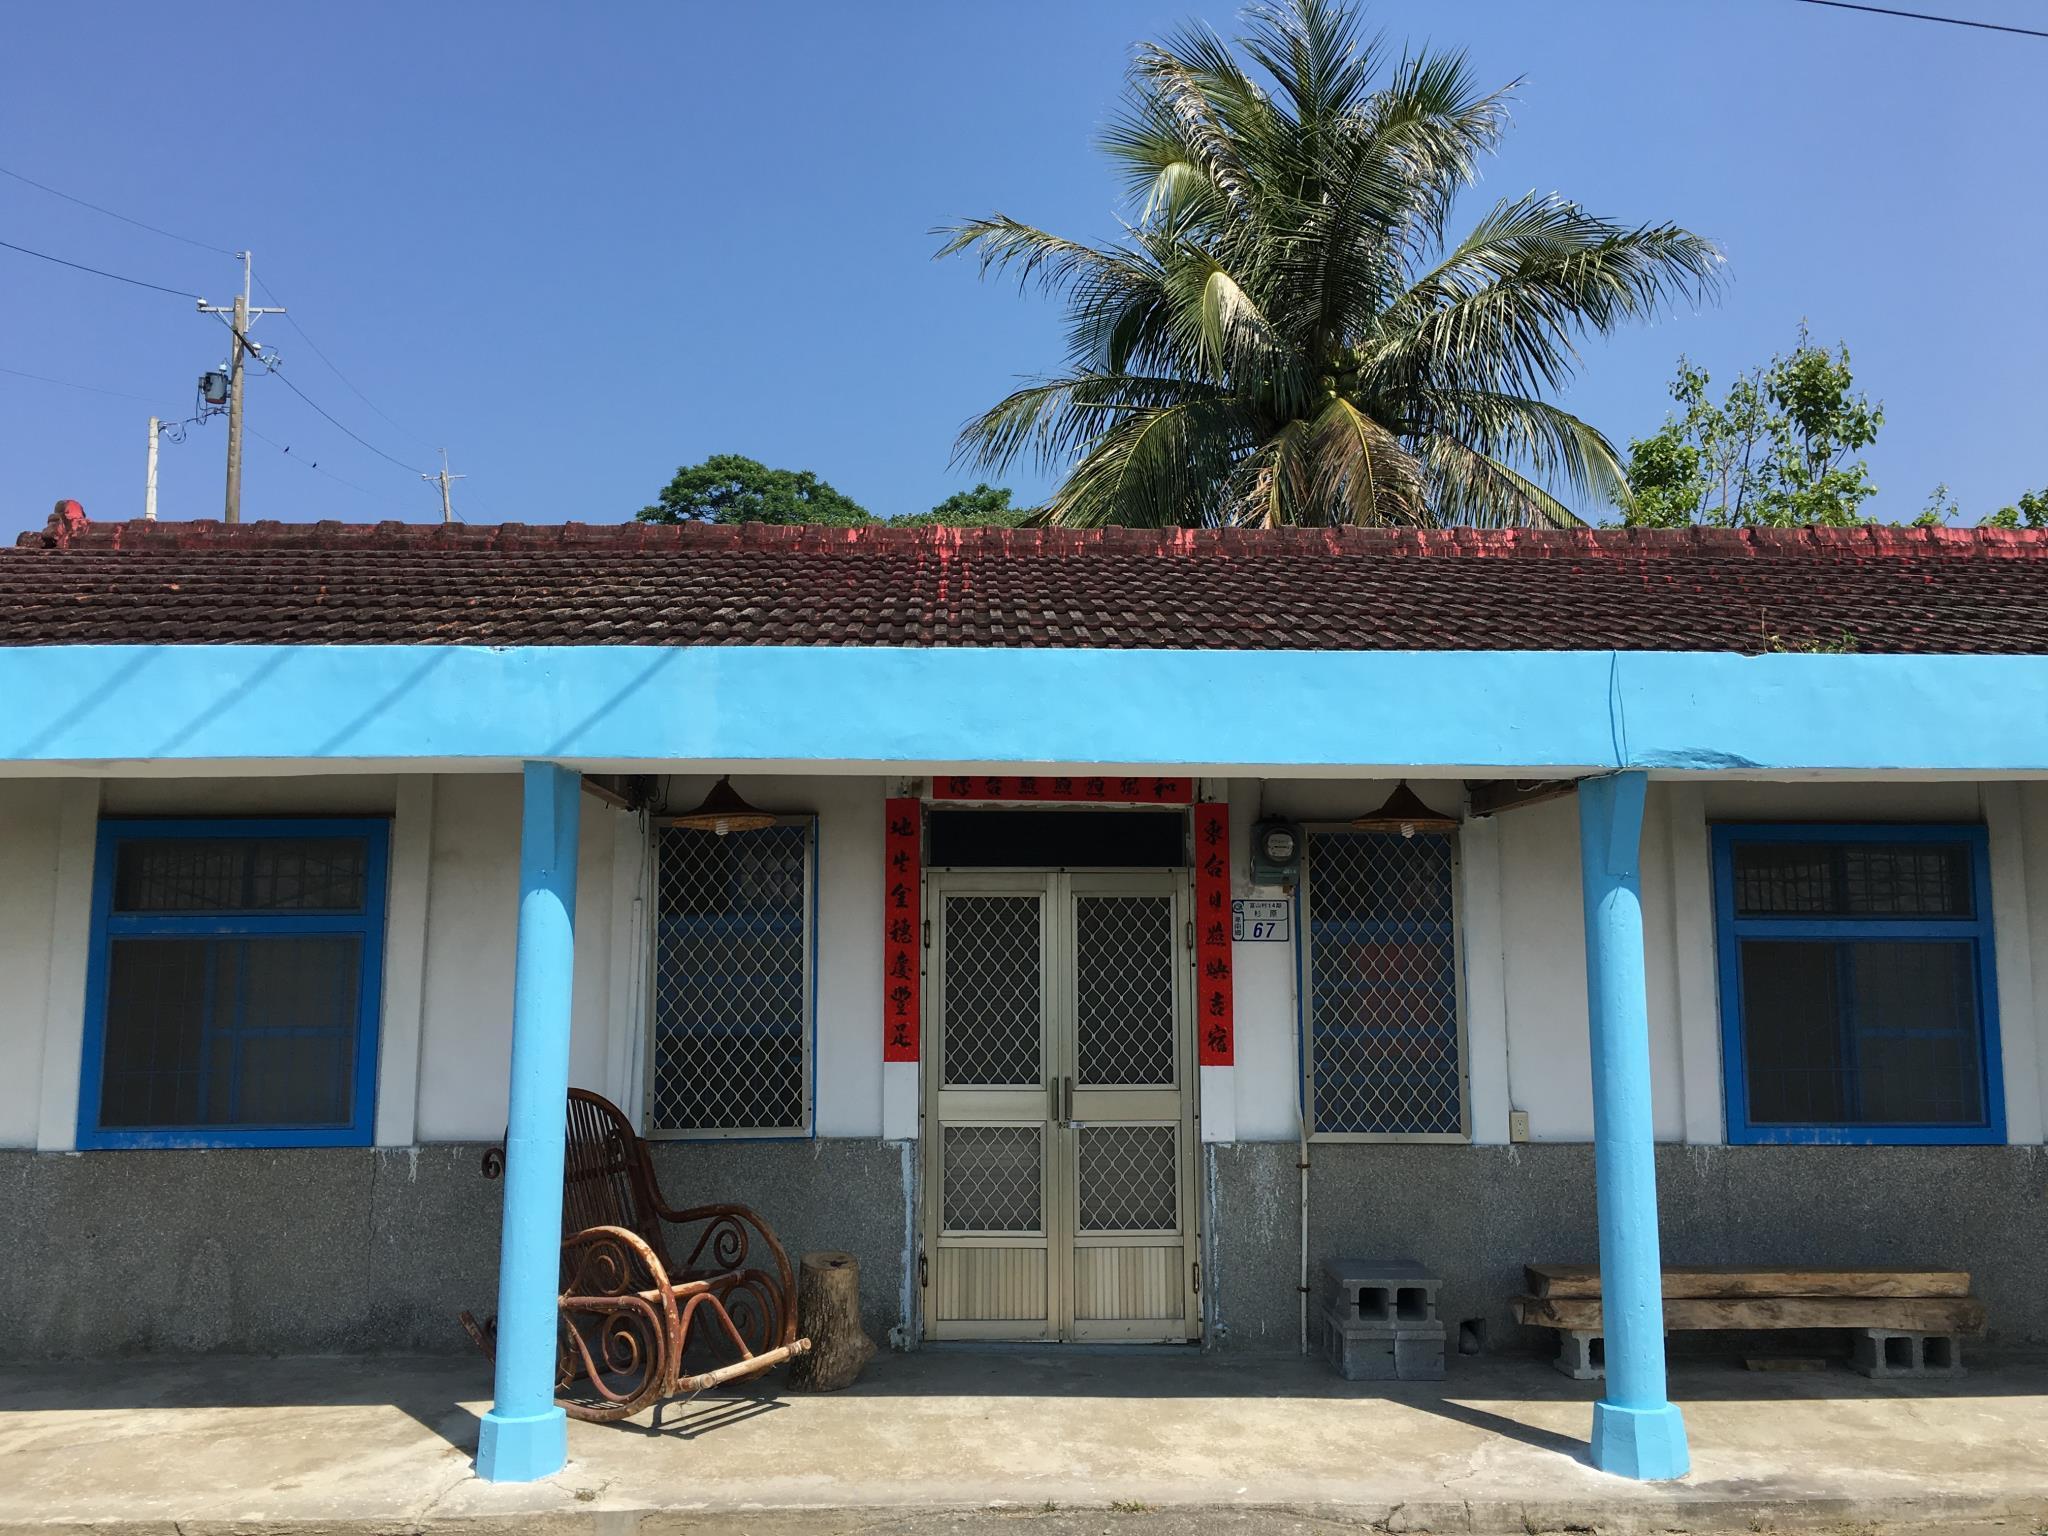 Shan Yuan Old House Taitung Promo Terbaru 2020 Rp 1146057 Foto Hd Ulasan